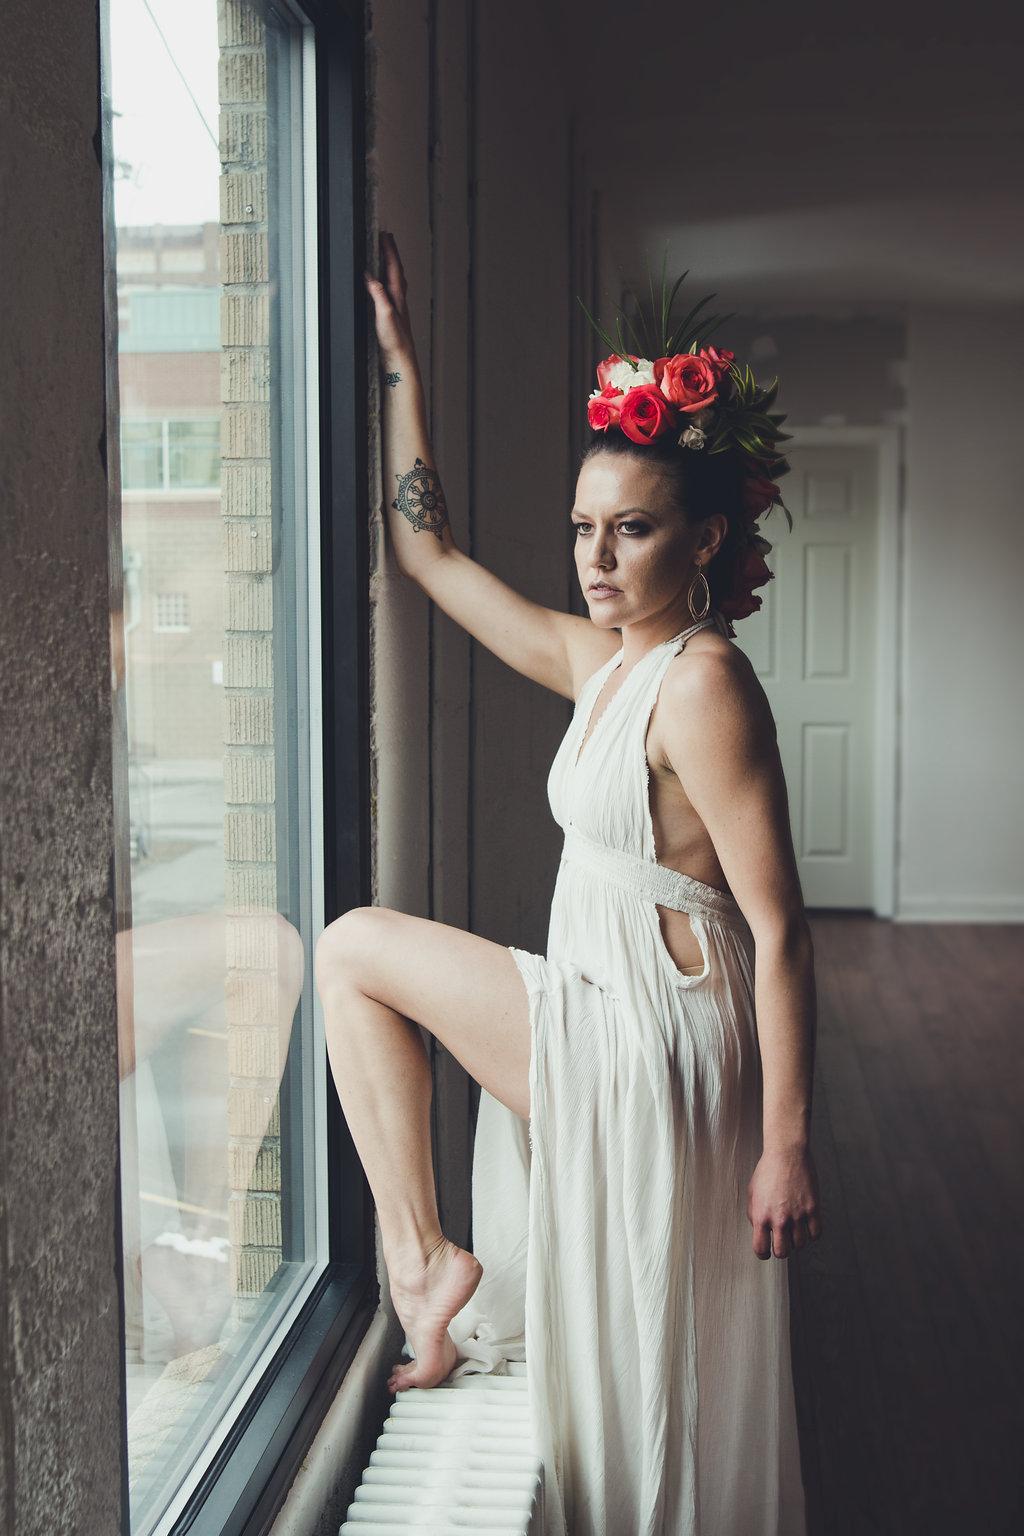 Lisa Rundall Wedding Photography Colorado model with leg on wall heater